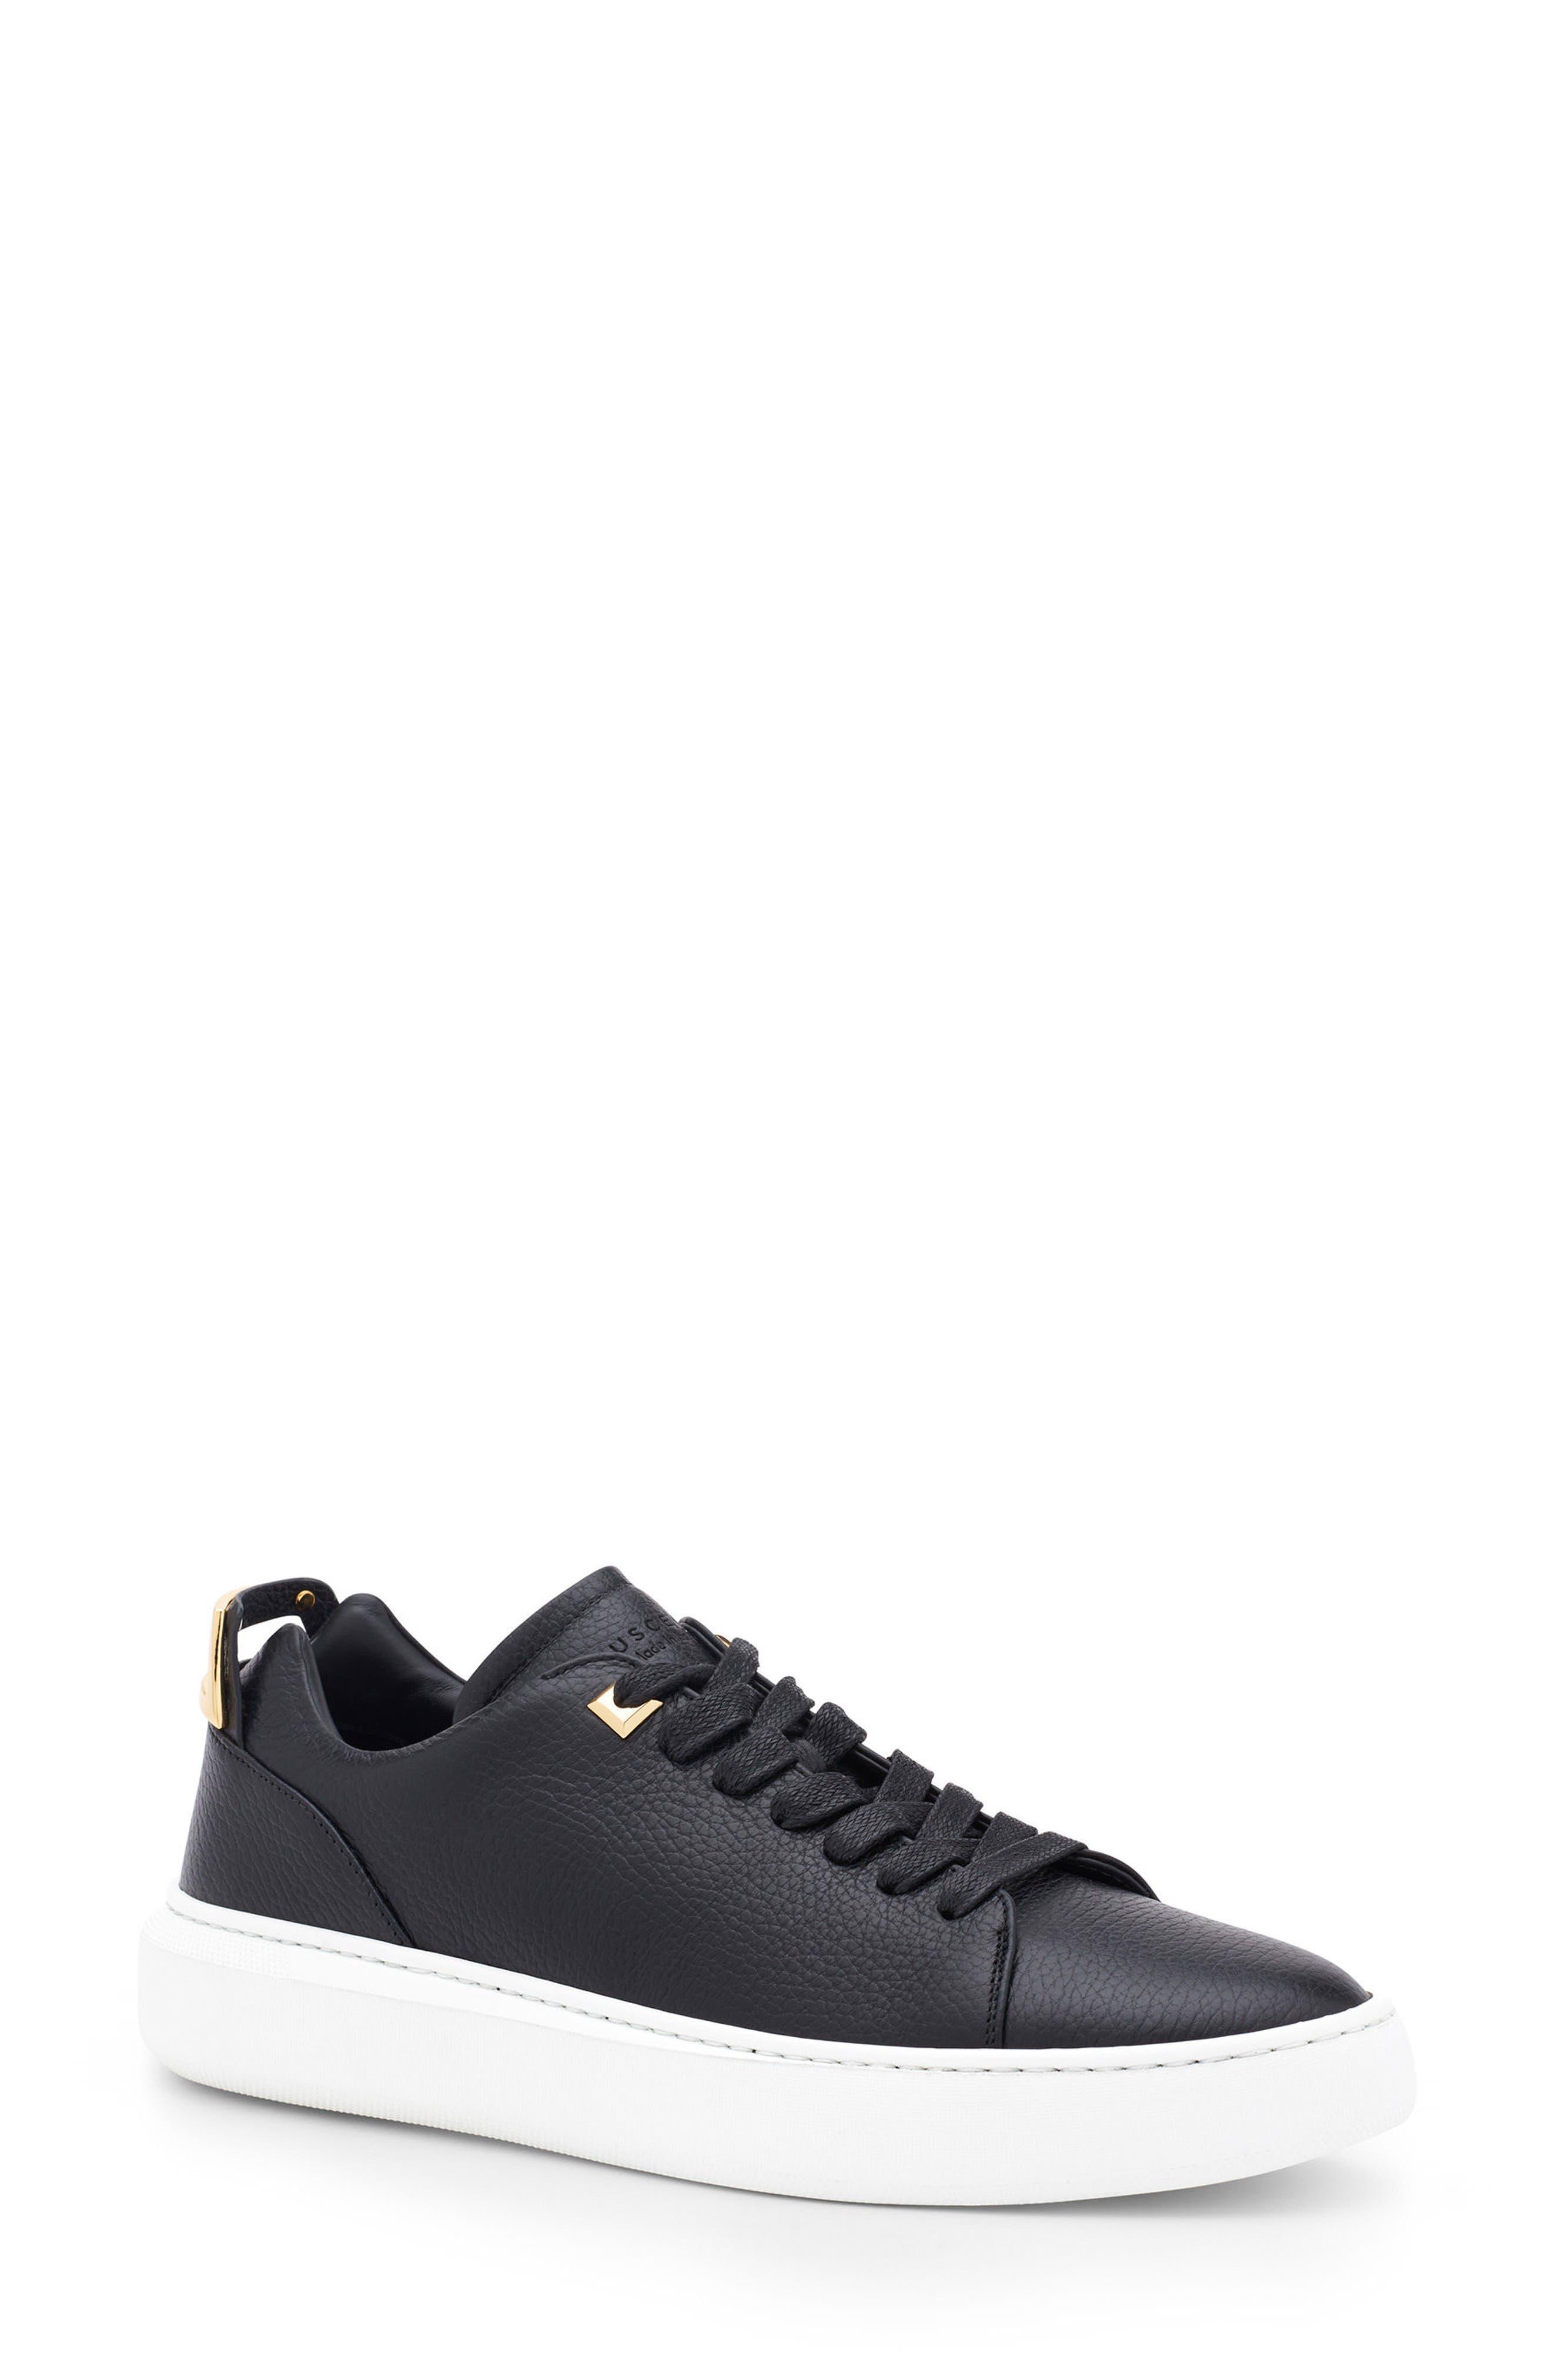 Main Image - Buscemi Uno Low Top Sneaker (Women)